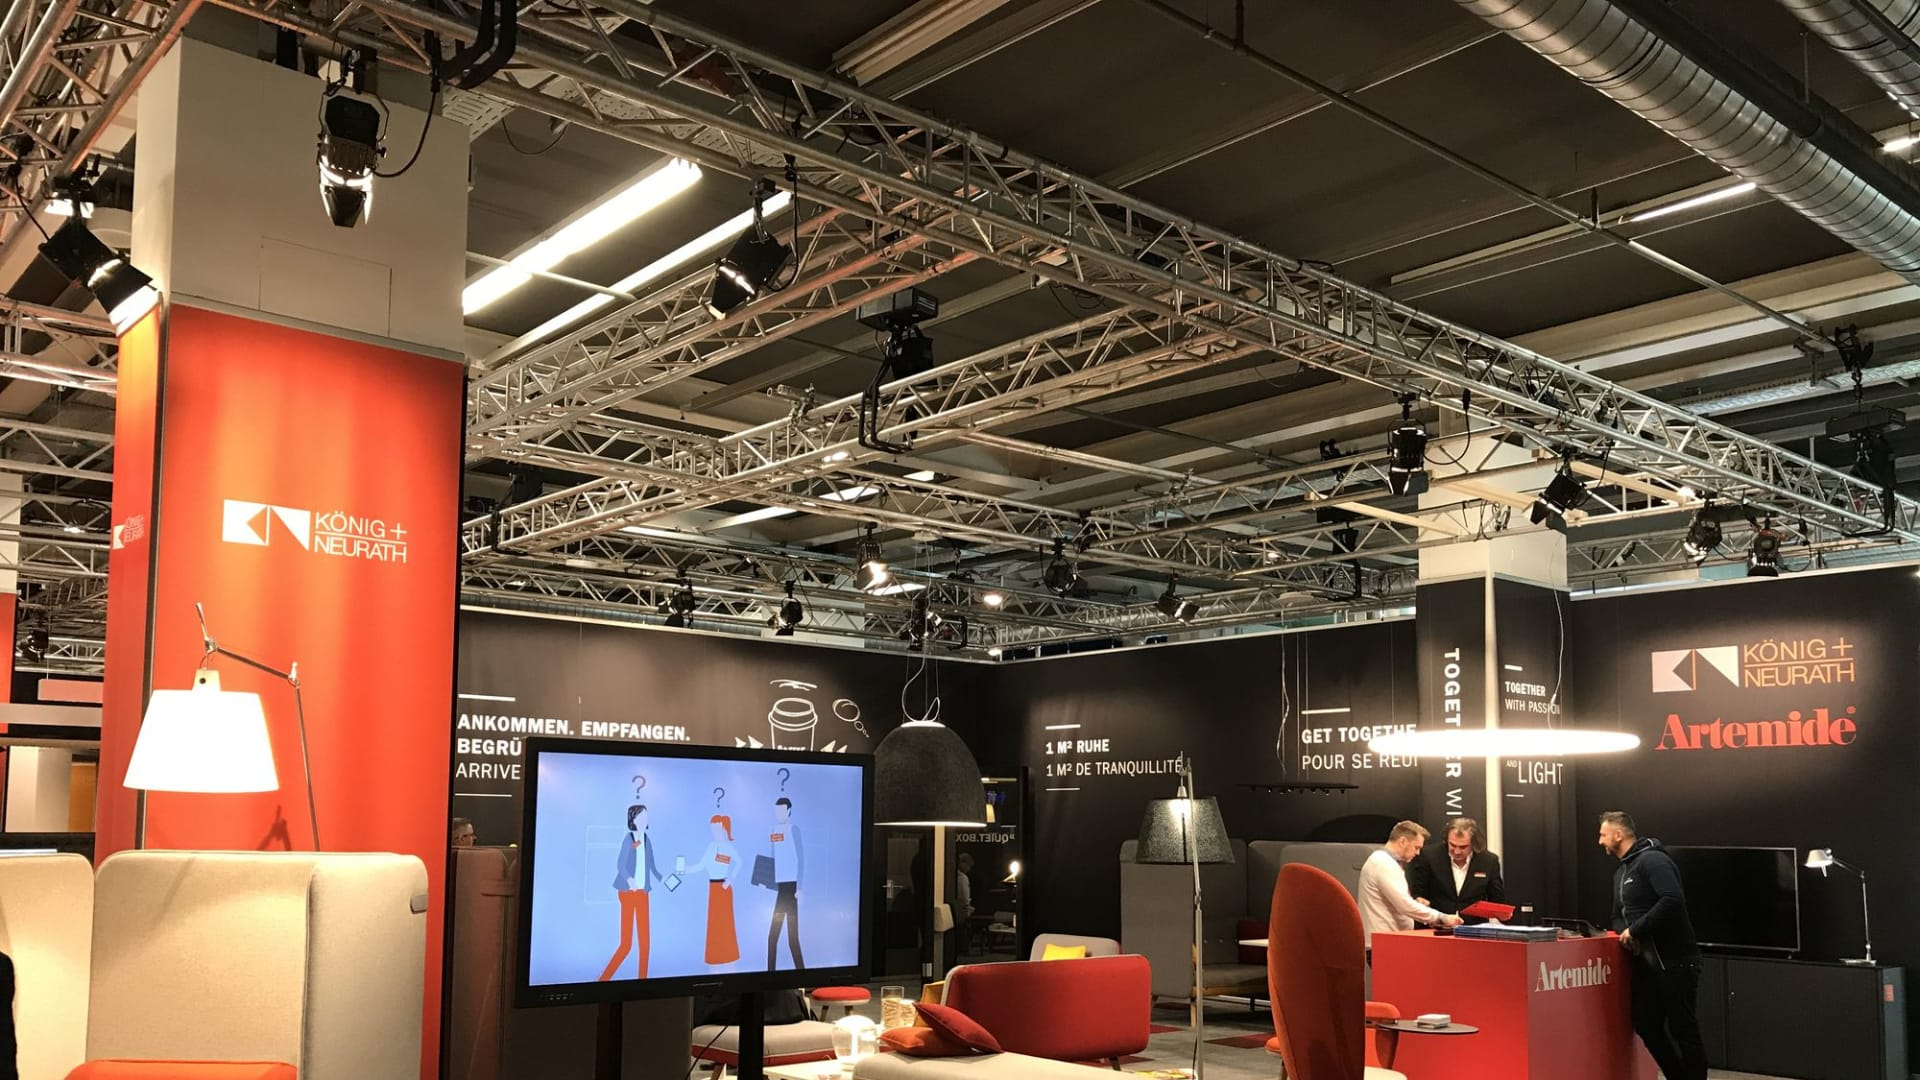 König + Neurath at Swissbau